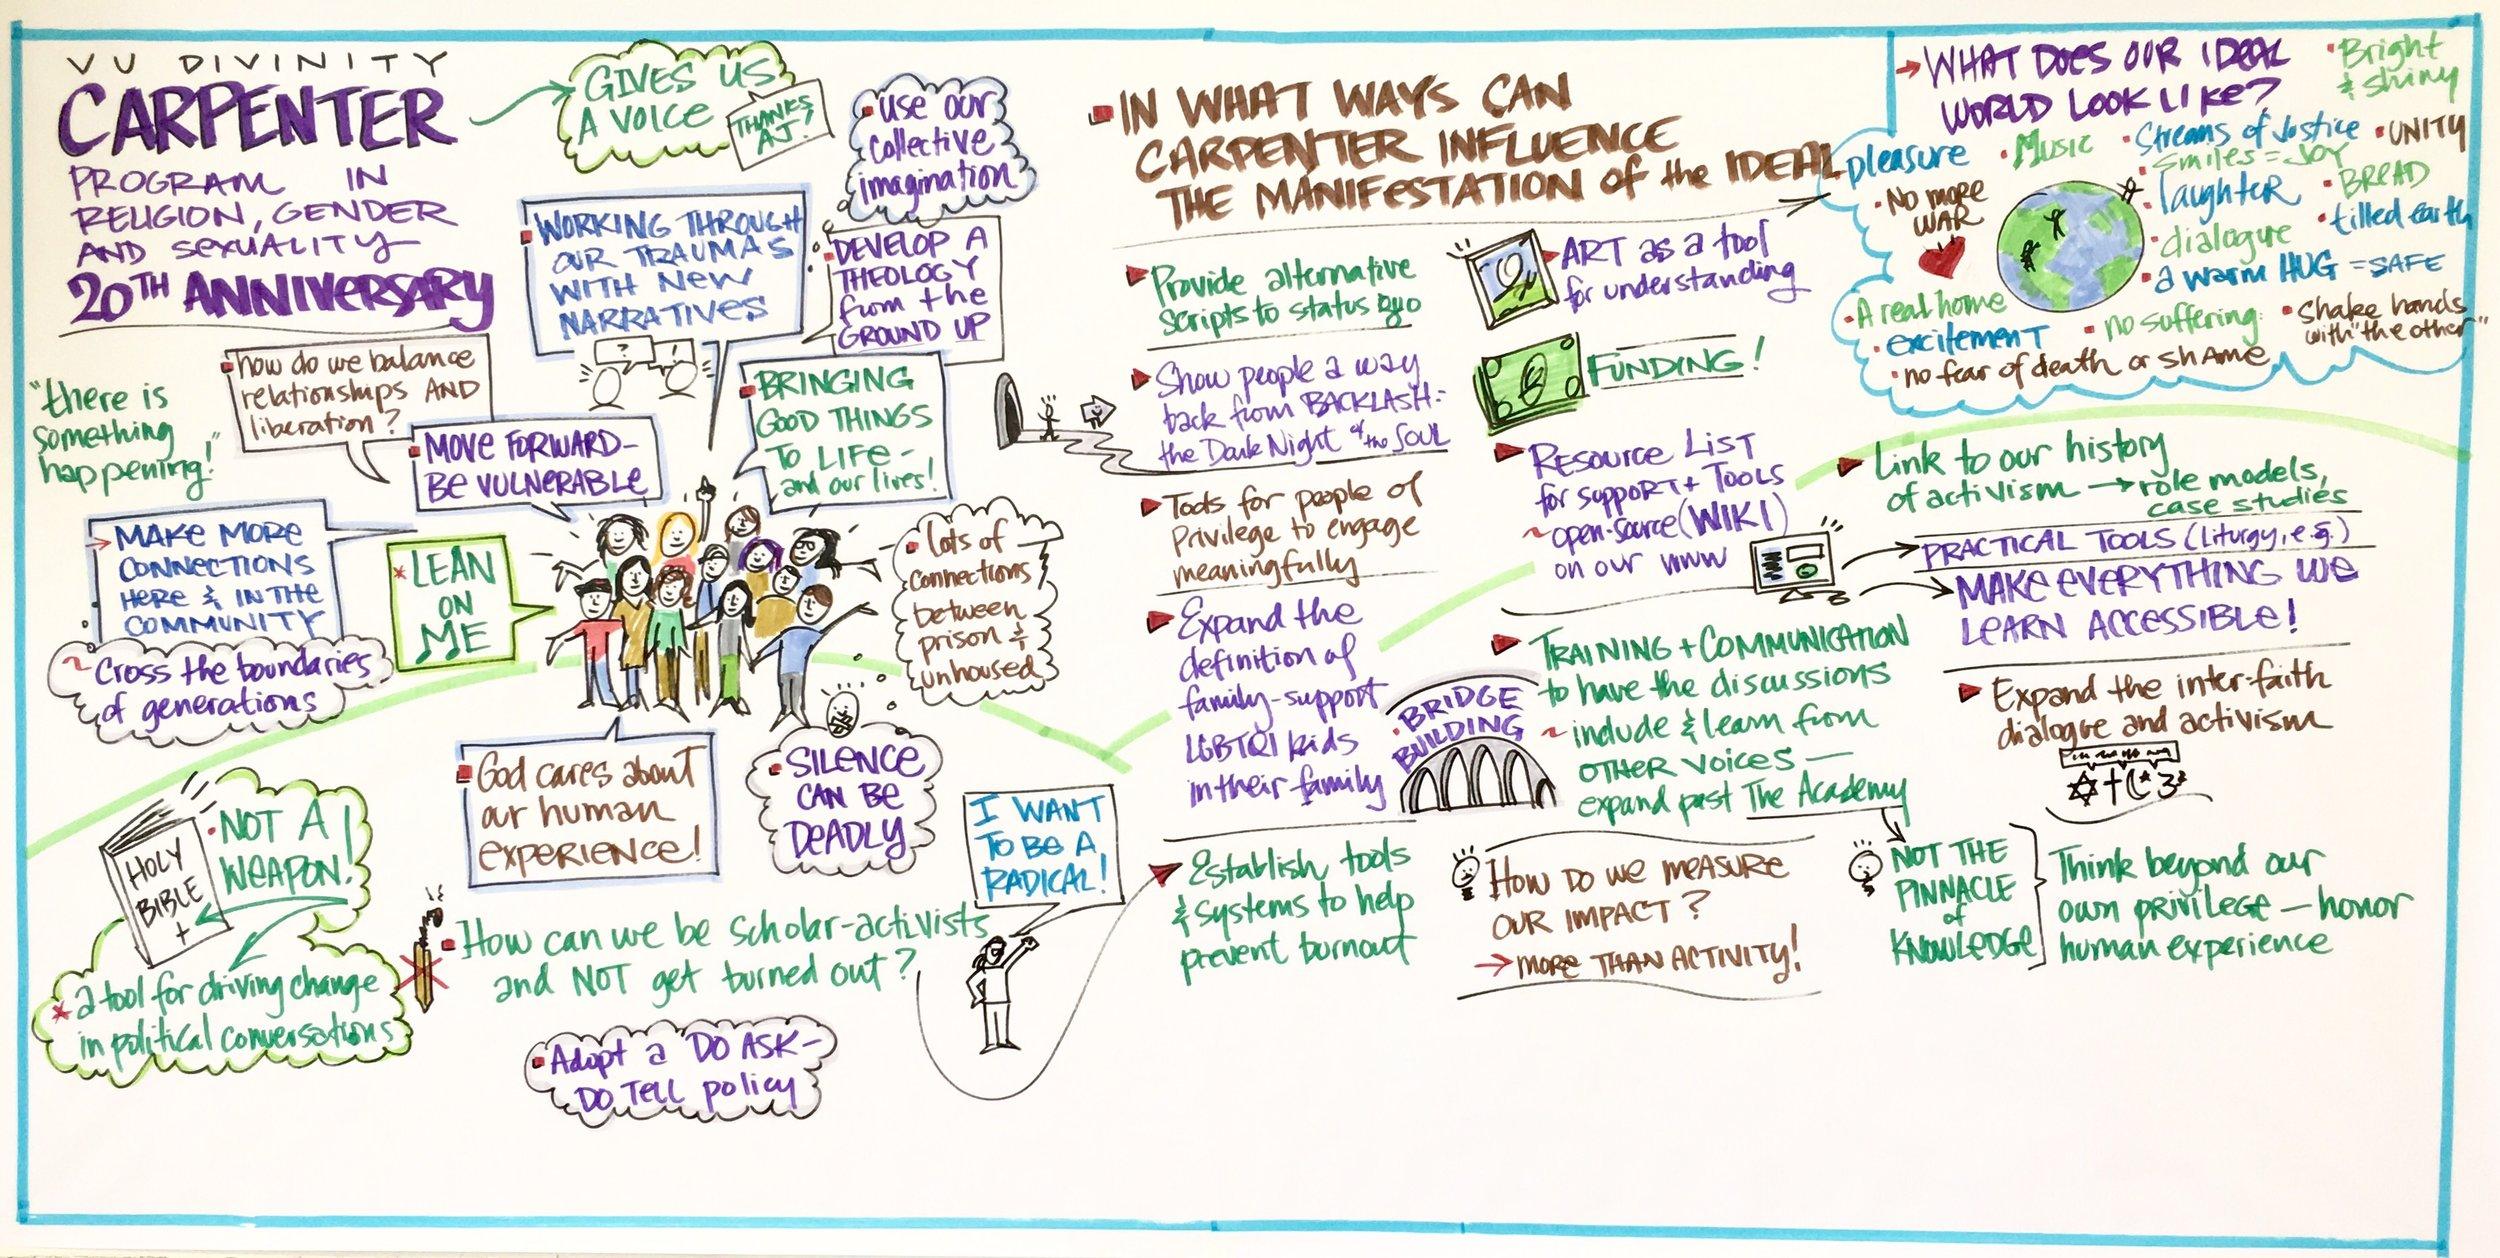 Carpenter Program collective vision